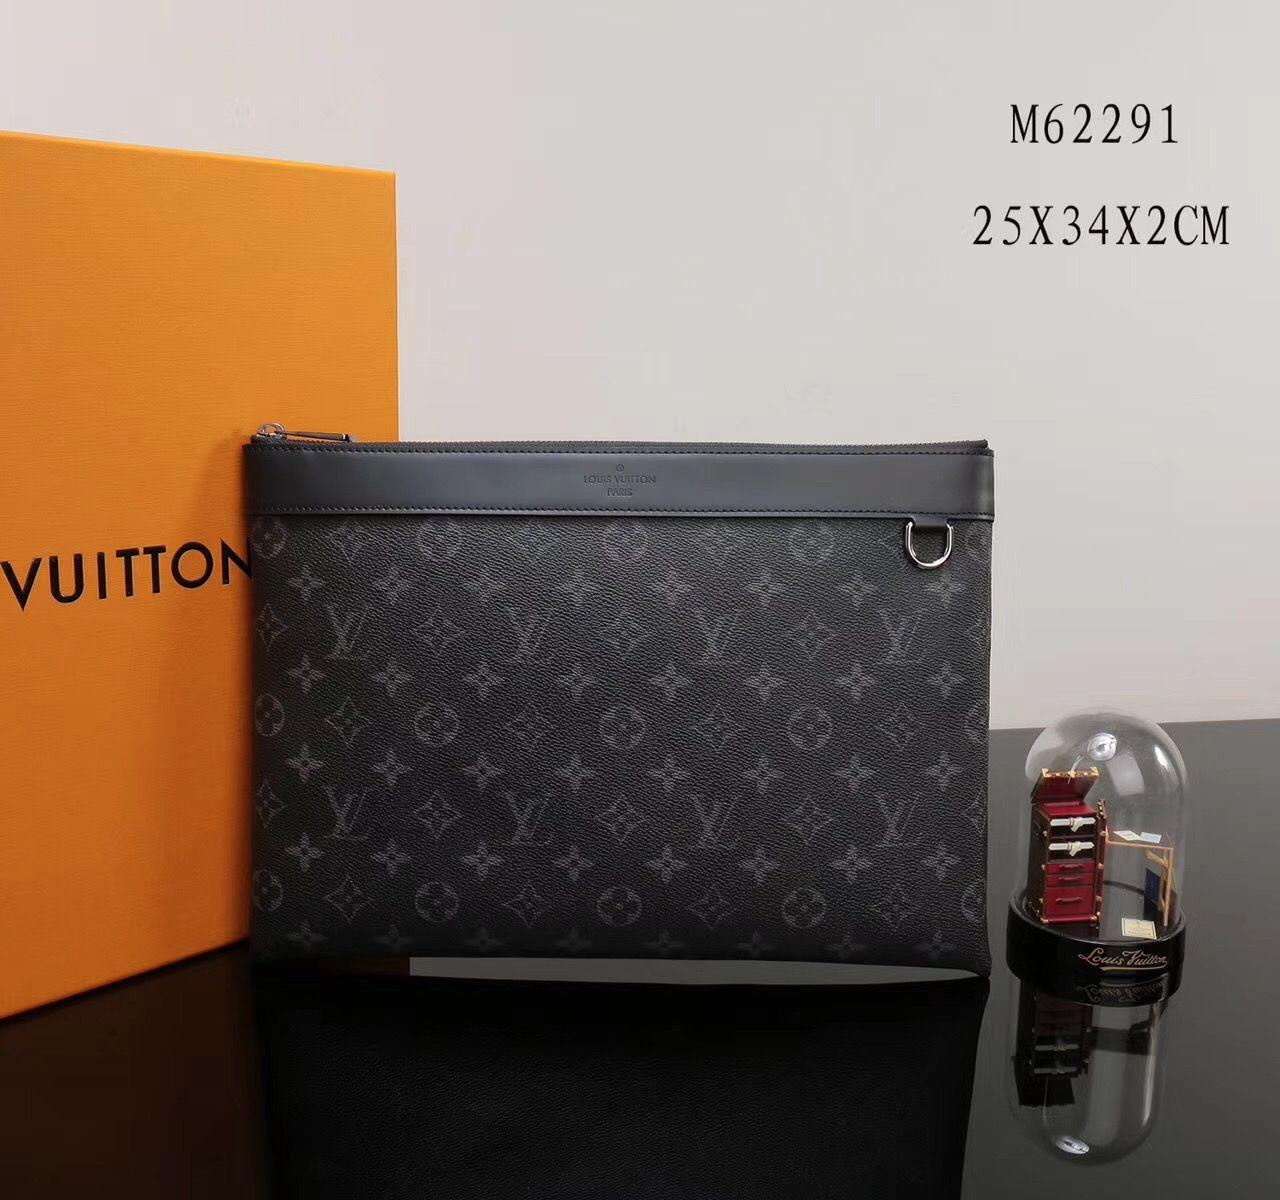 Replica Men Lv Louis Vuitton M62291 Pochette Apollo Clutch Bag Monogram Handbag Gray Monogram Handbag Clutch Bag Vuitton